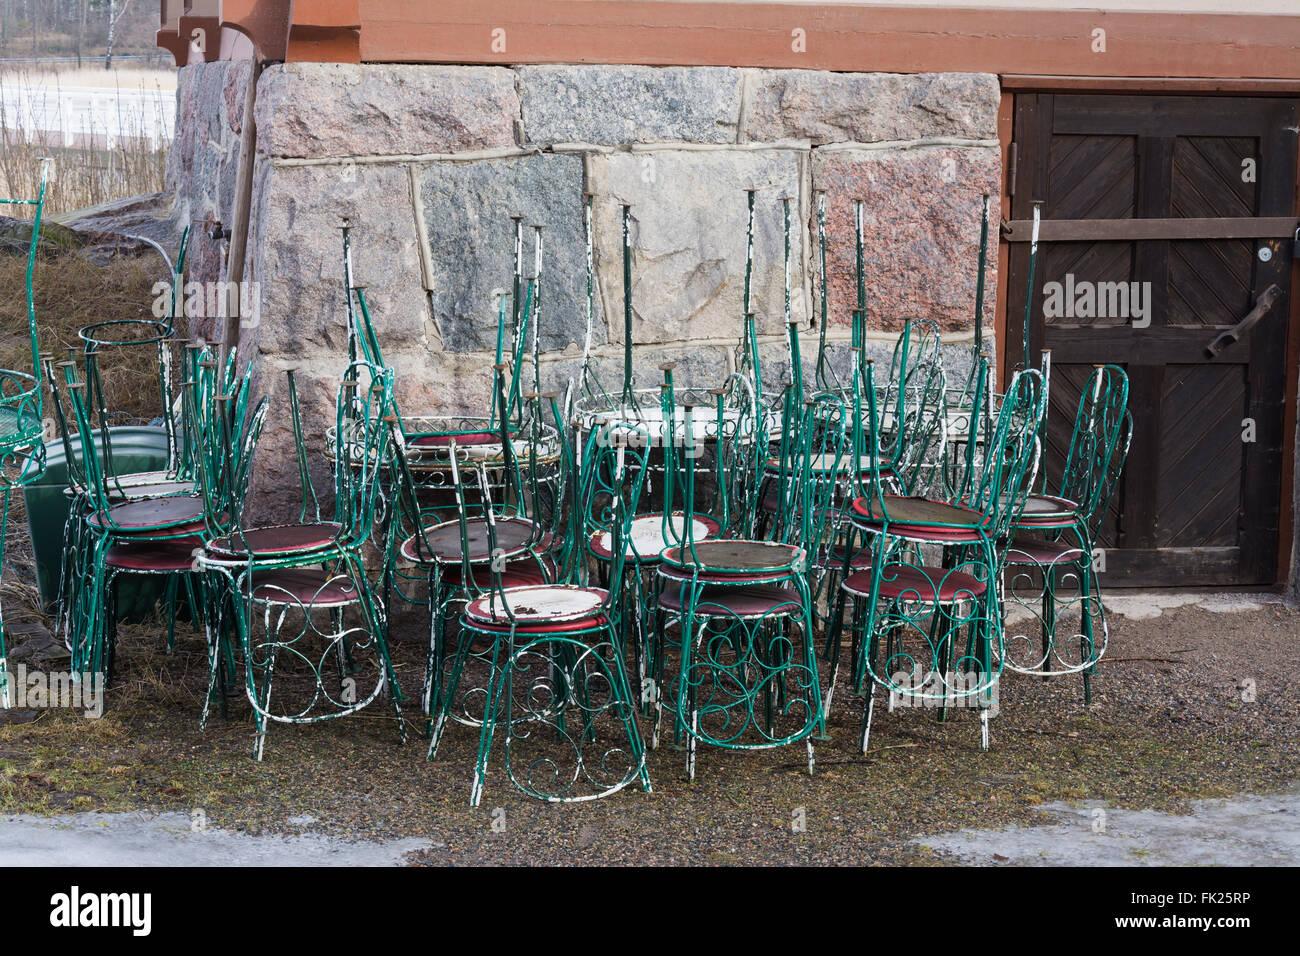 Piled Cafe Chairs at Seurasaari Open-Air Museum - Stock Image